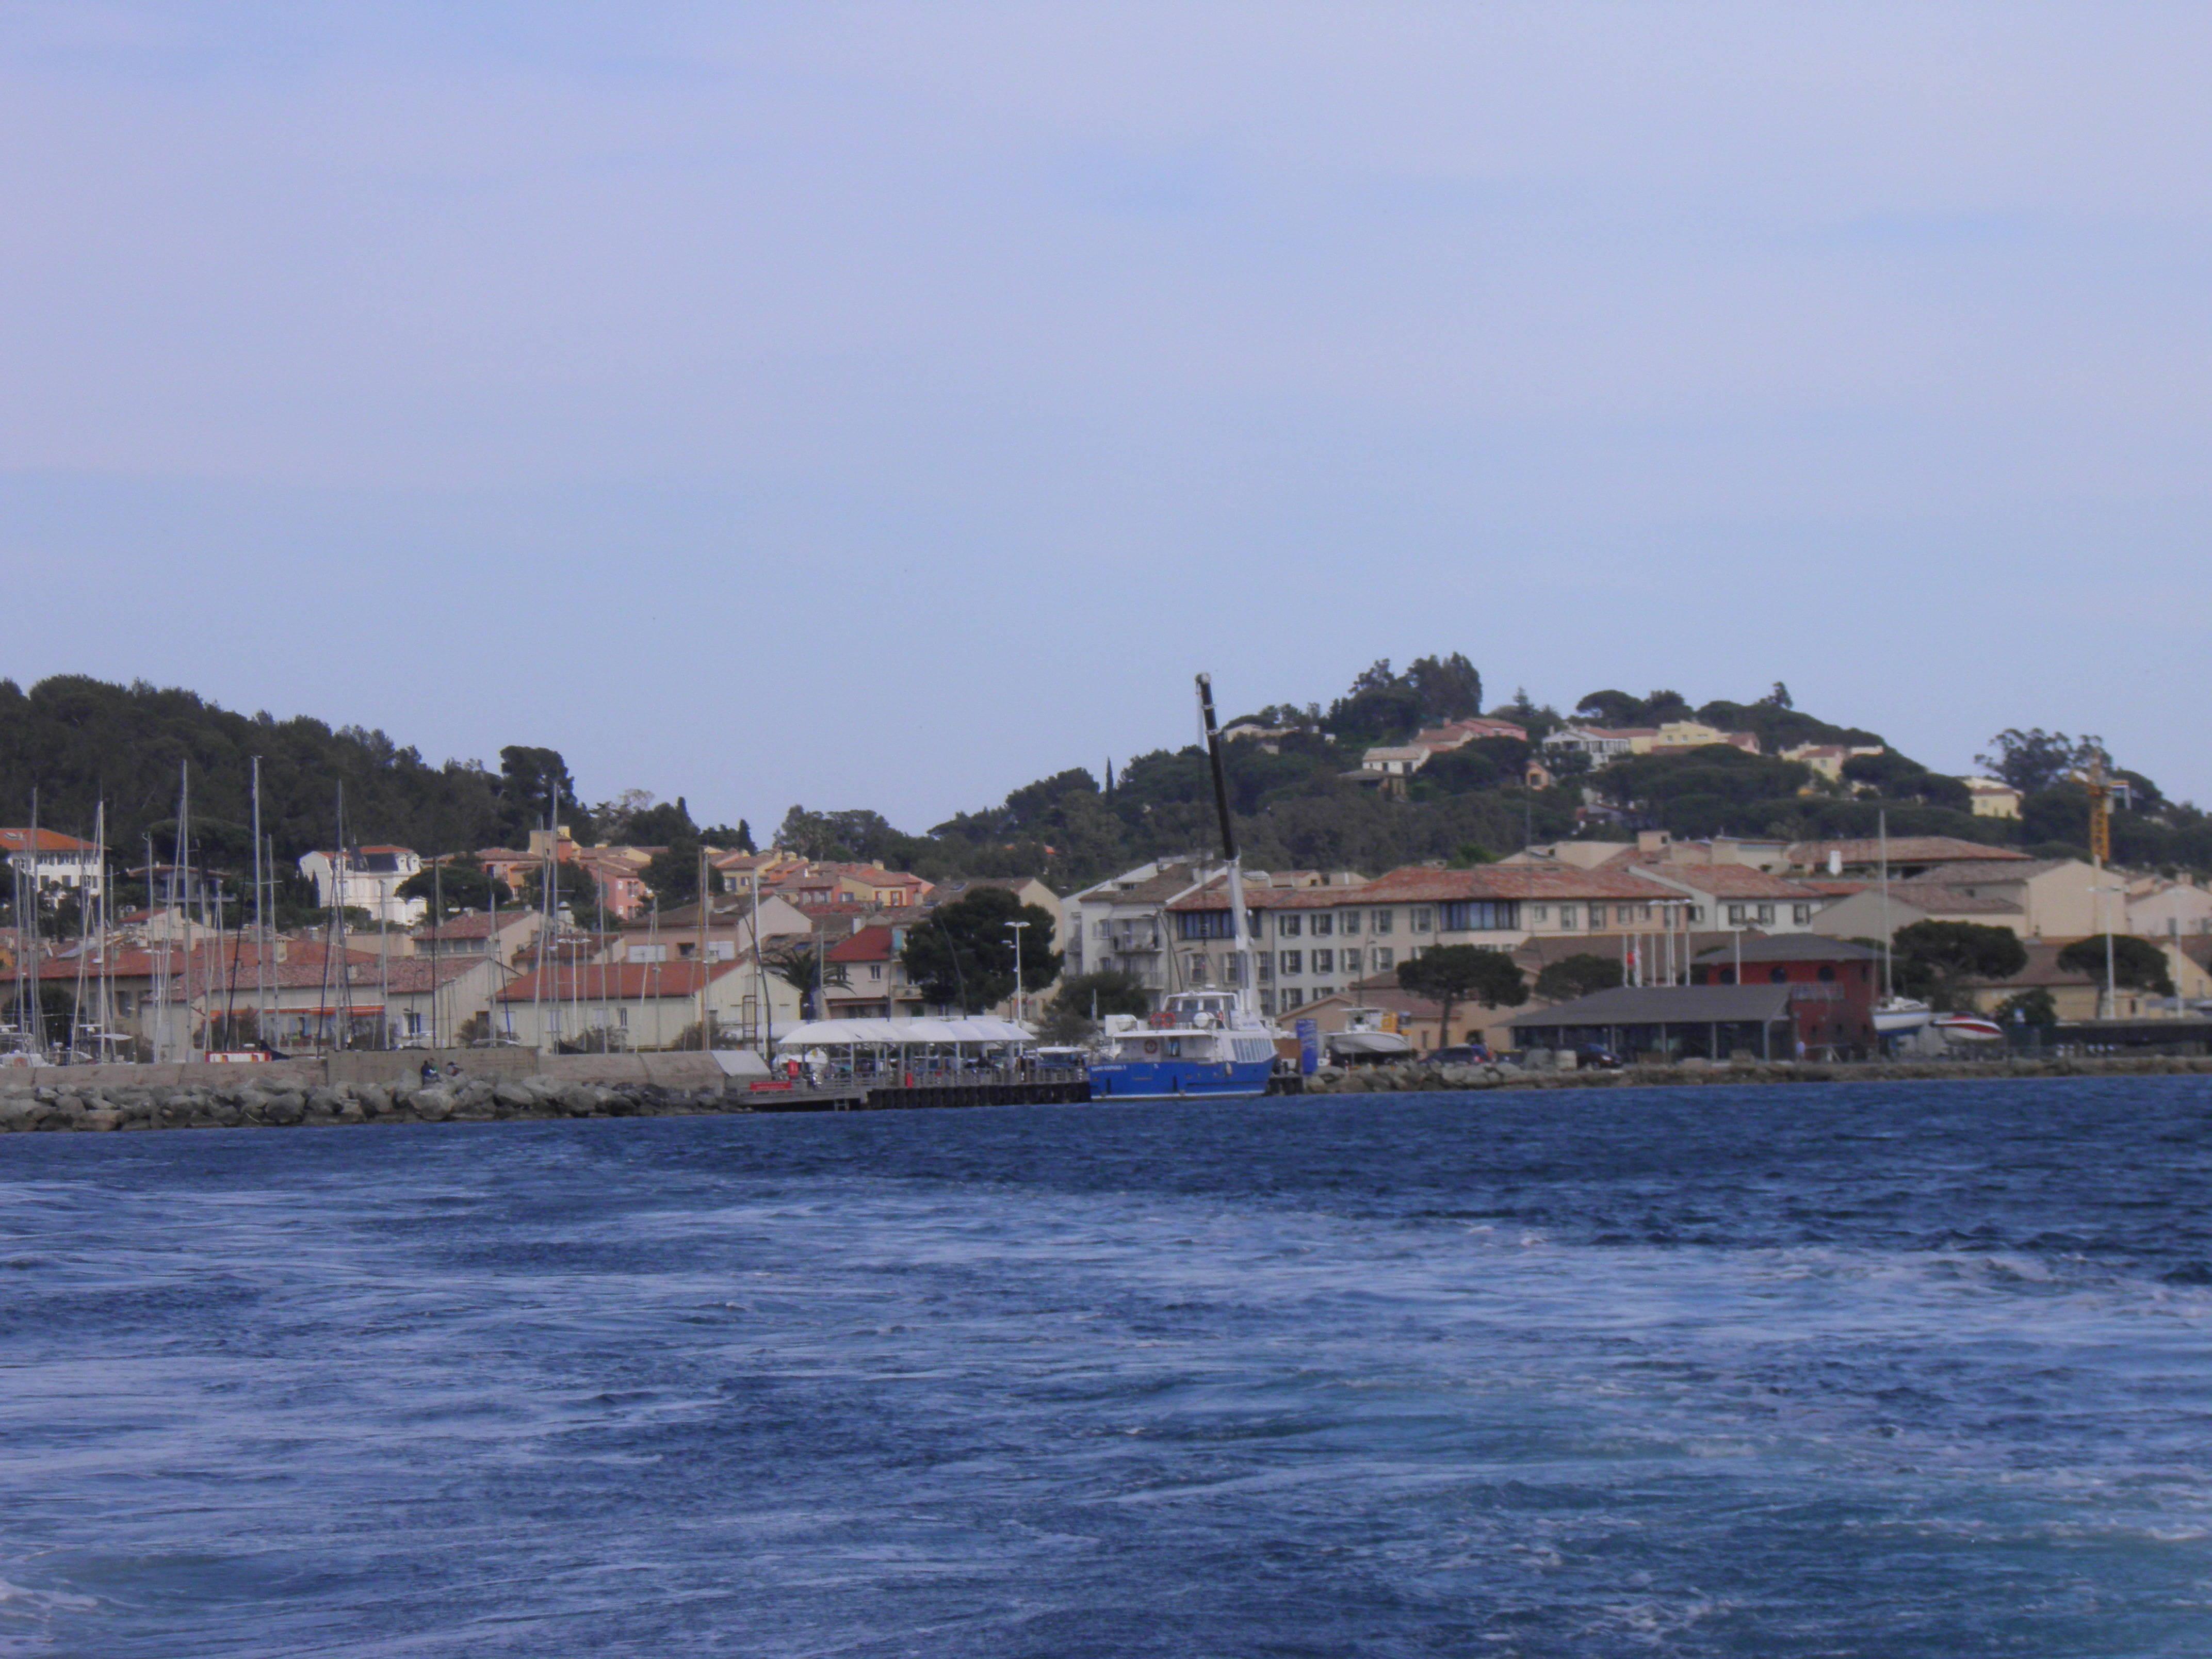 Fileport Saint Tropez 09jpg Wikimedia Commons